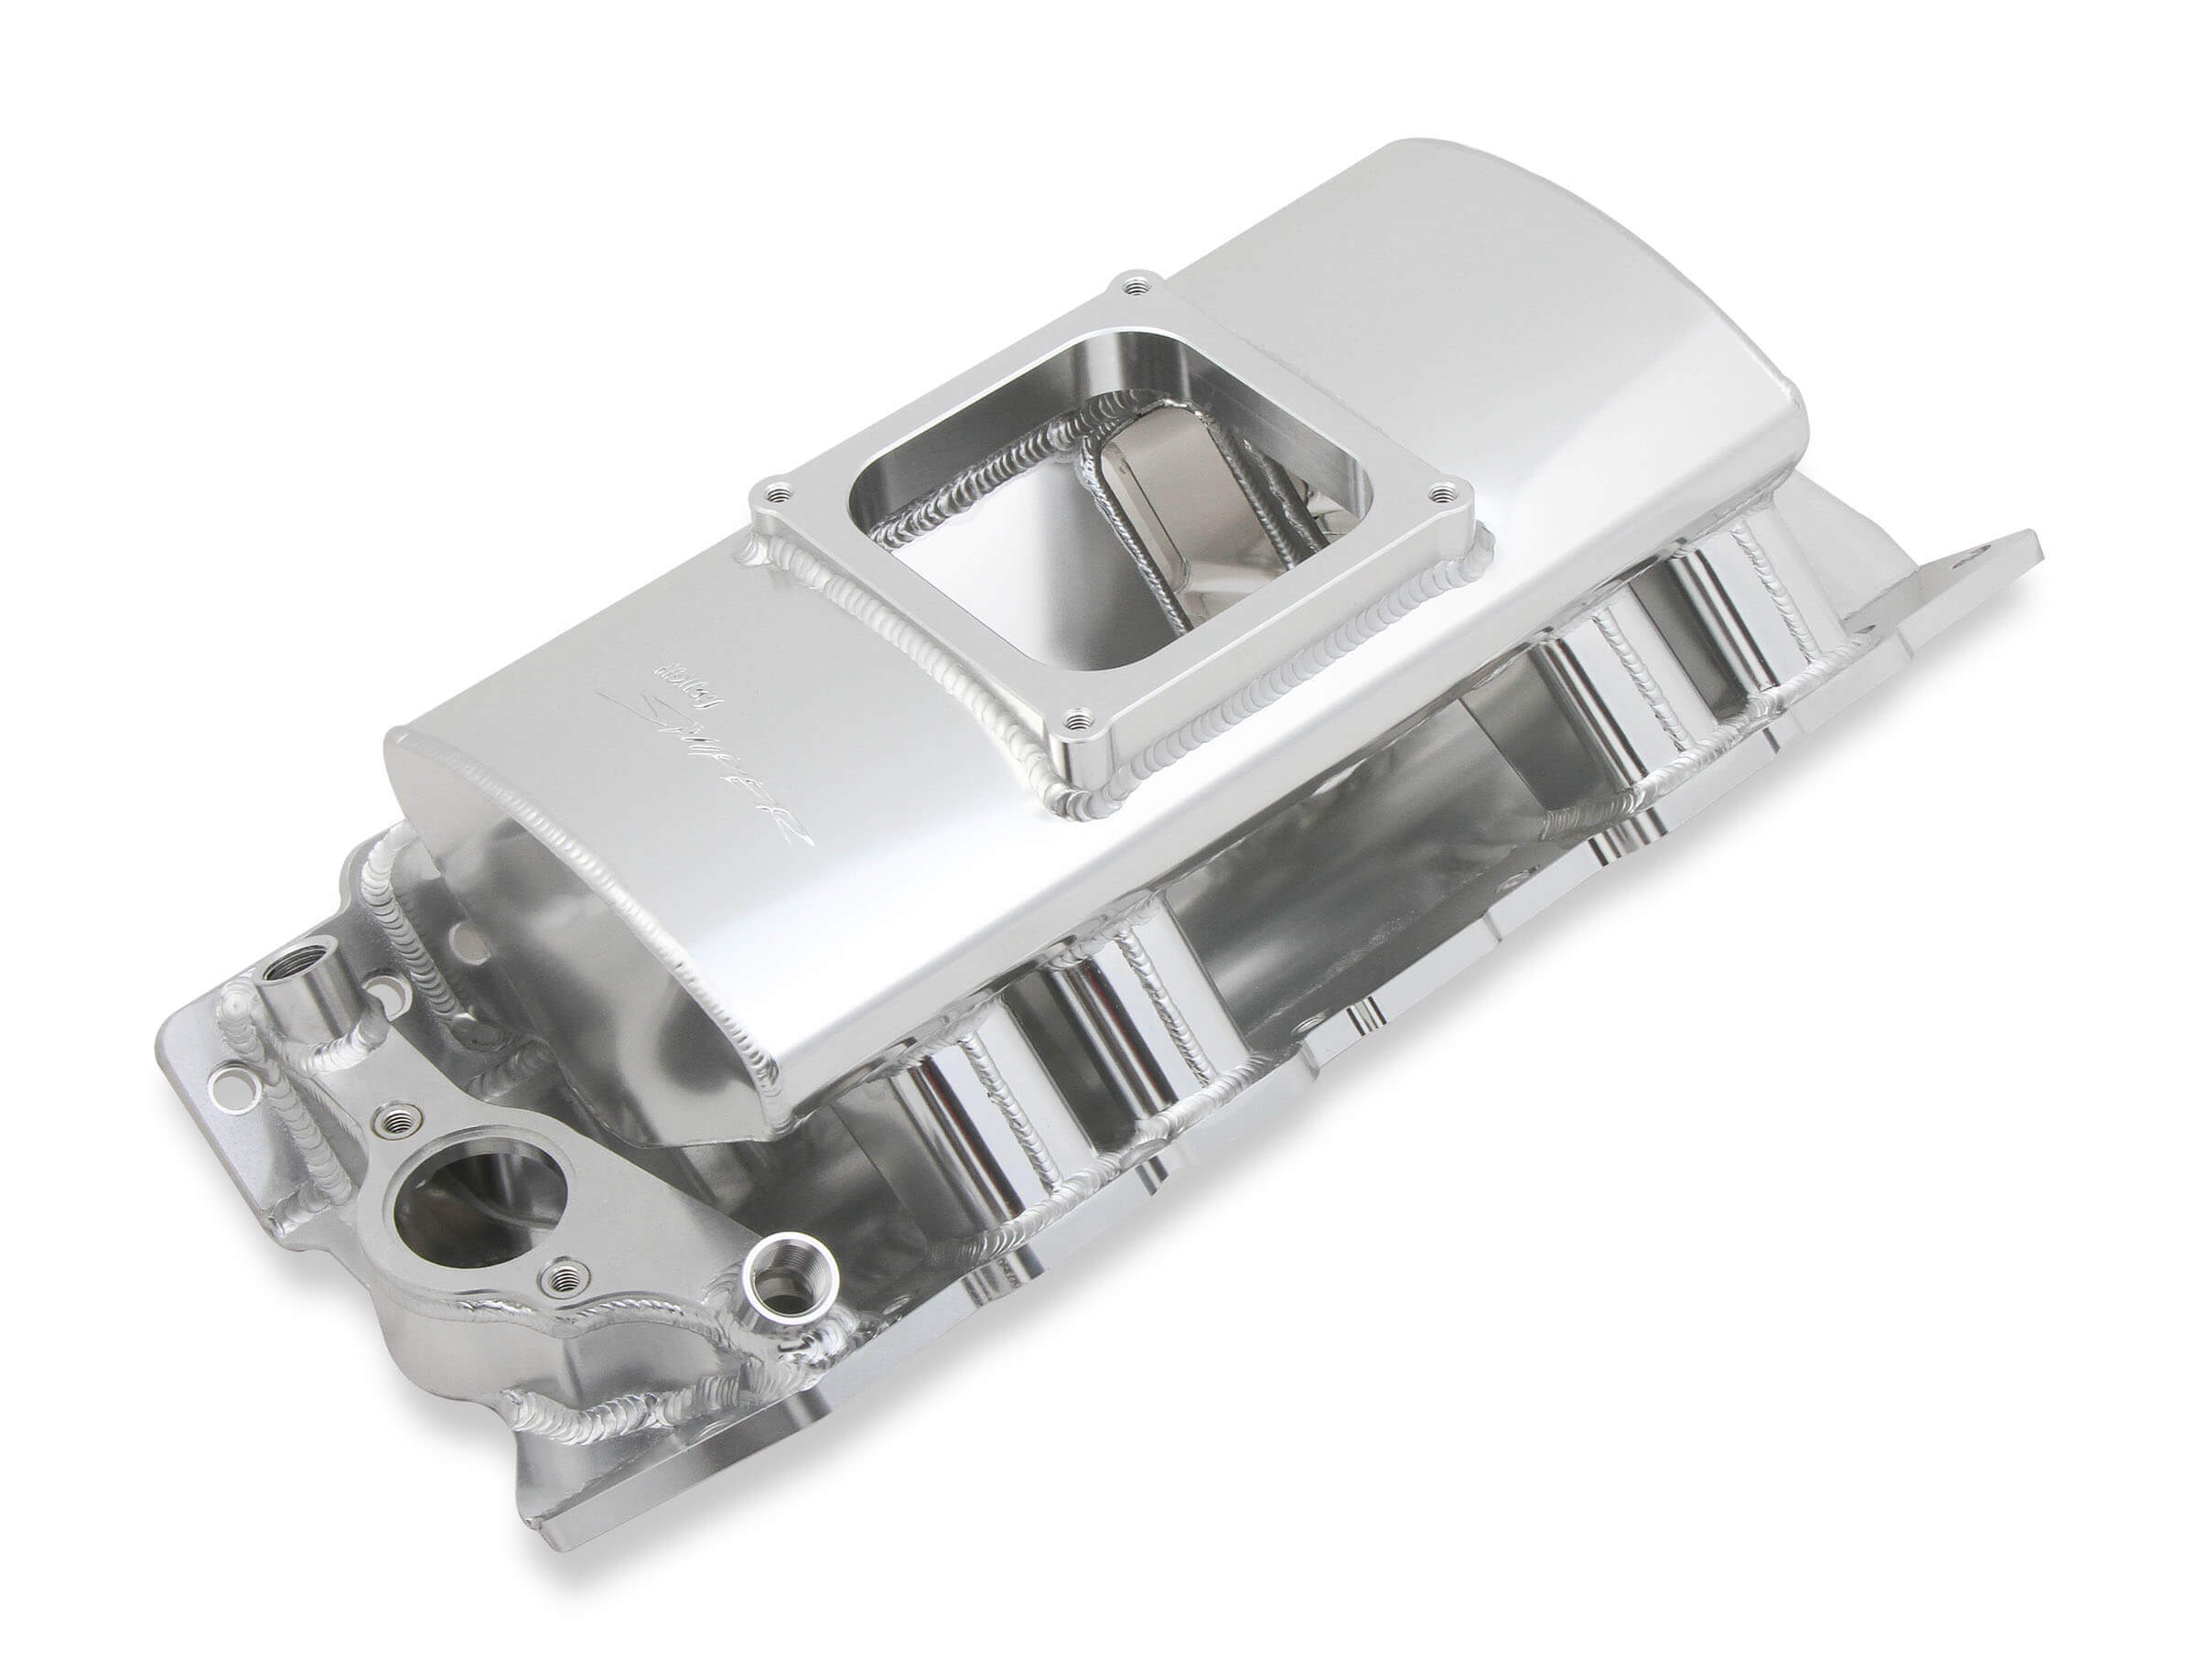 Holley 835161 Intake Manifold, Sniper Sheet Metal Fabricated, Square Bore, Single Plane, Rectangle Port, Sniper Logo, Aluminum, Silver, Big Block Chevy, Kit